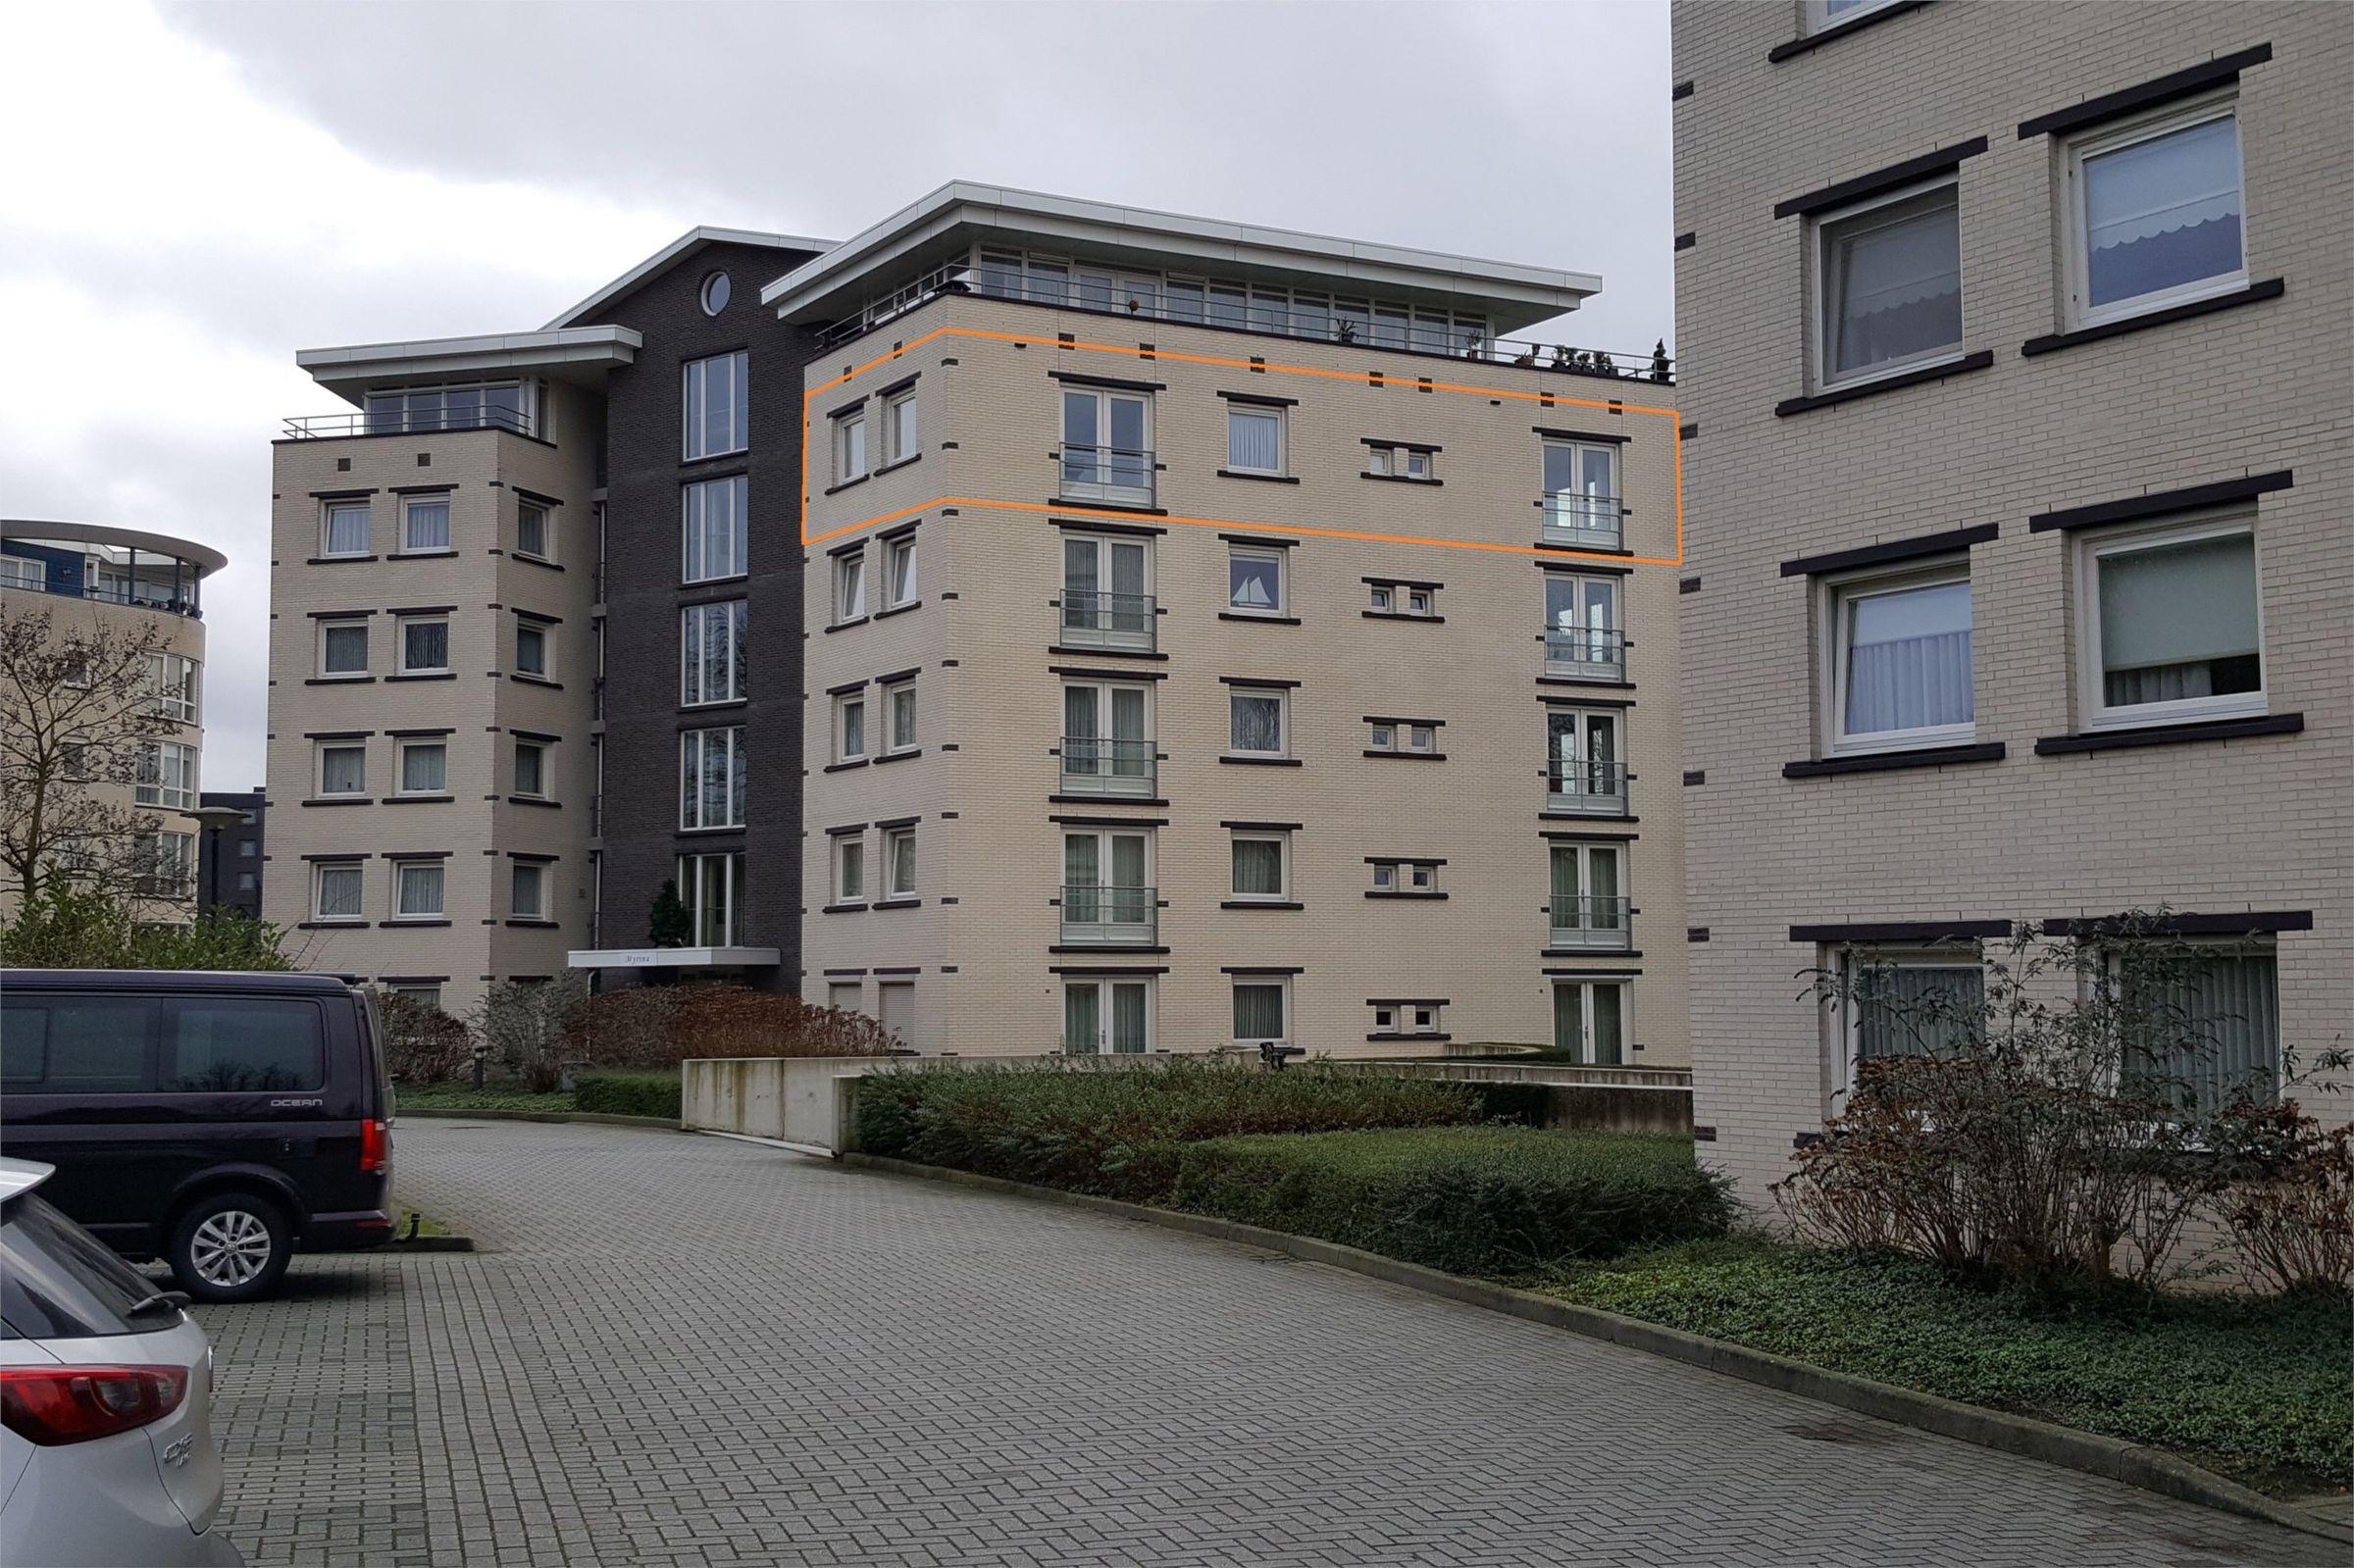 Vlinderparkweg 98, Deventer